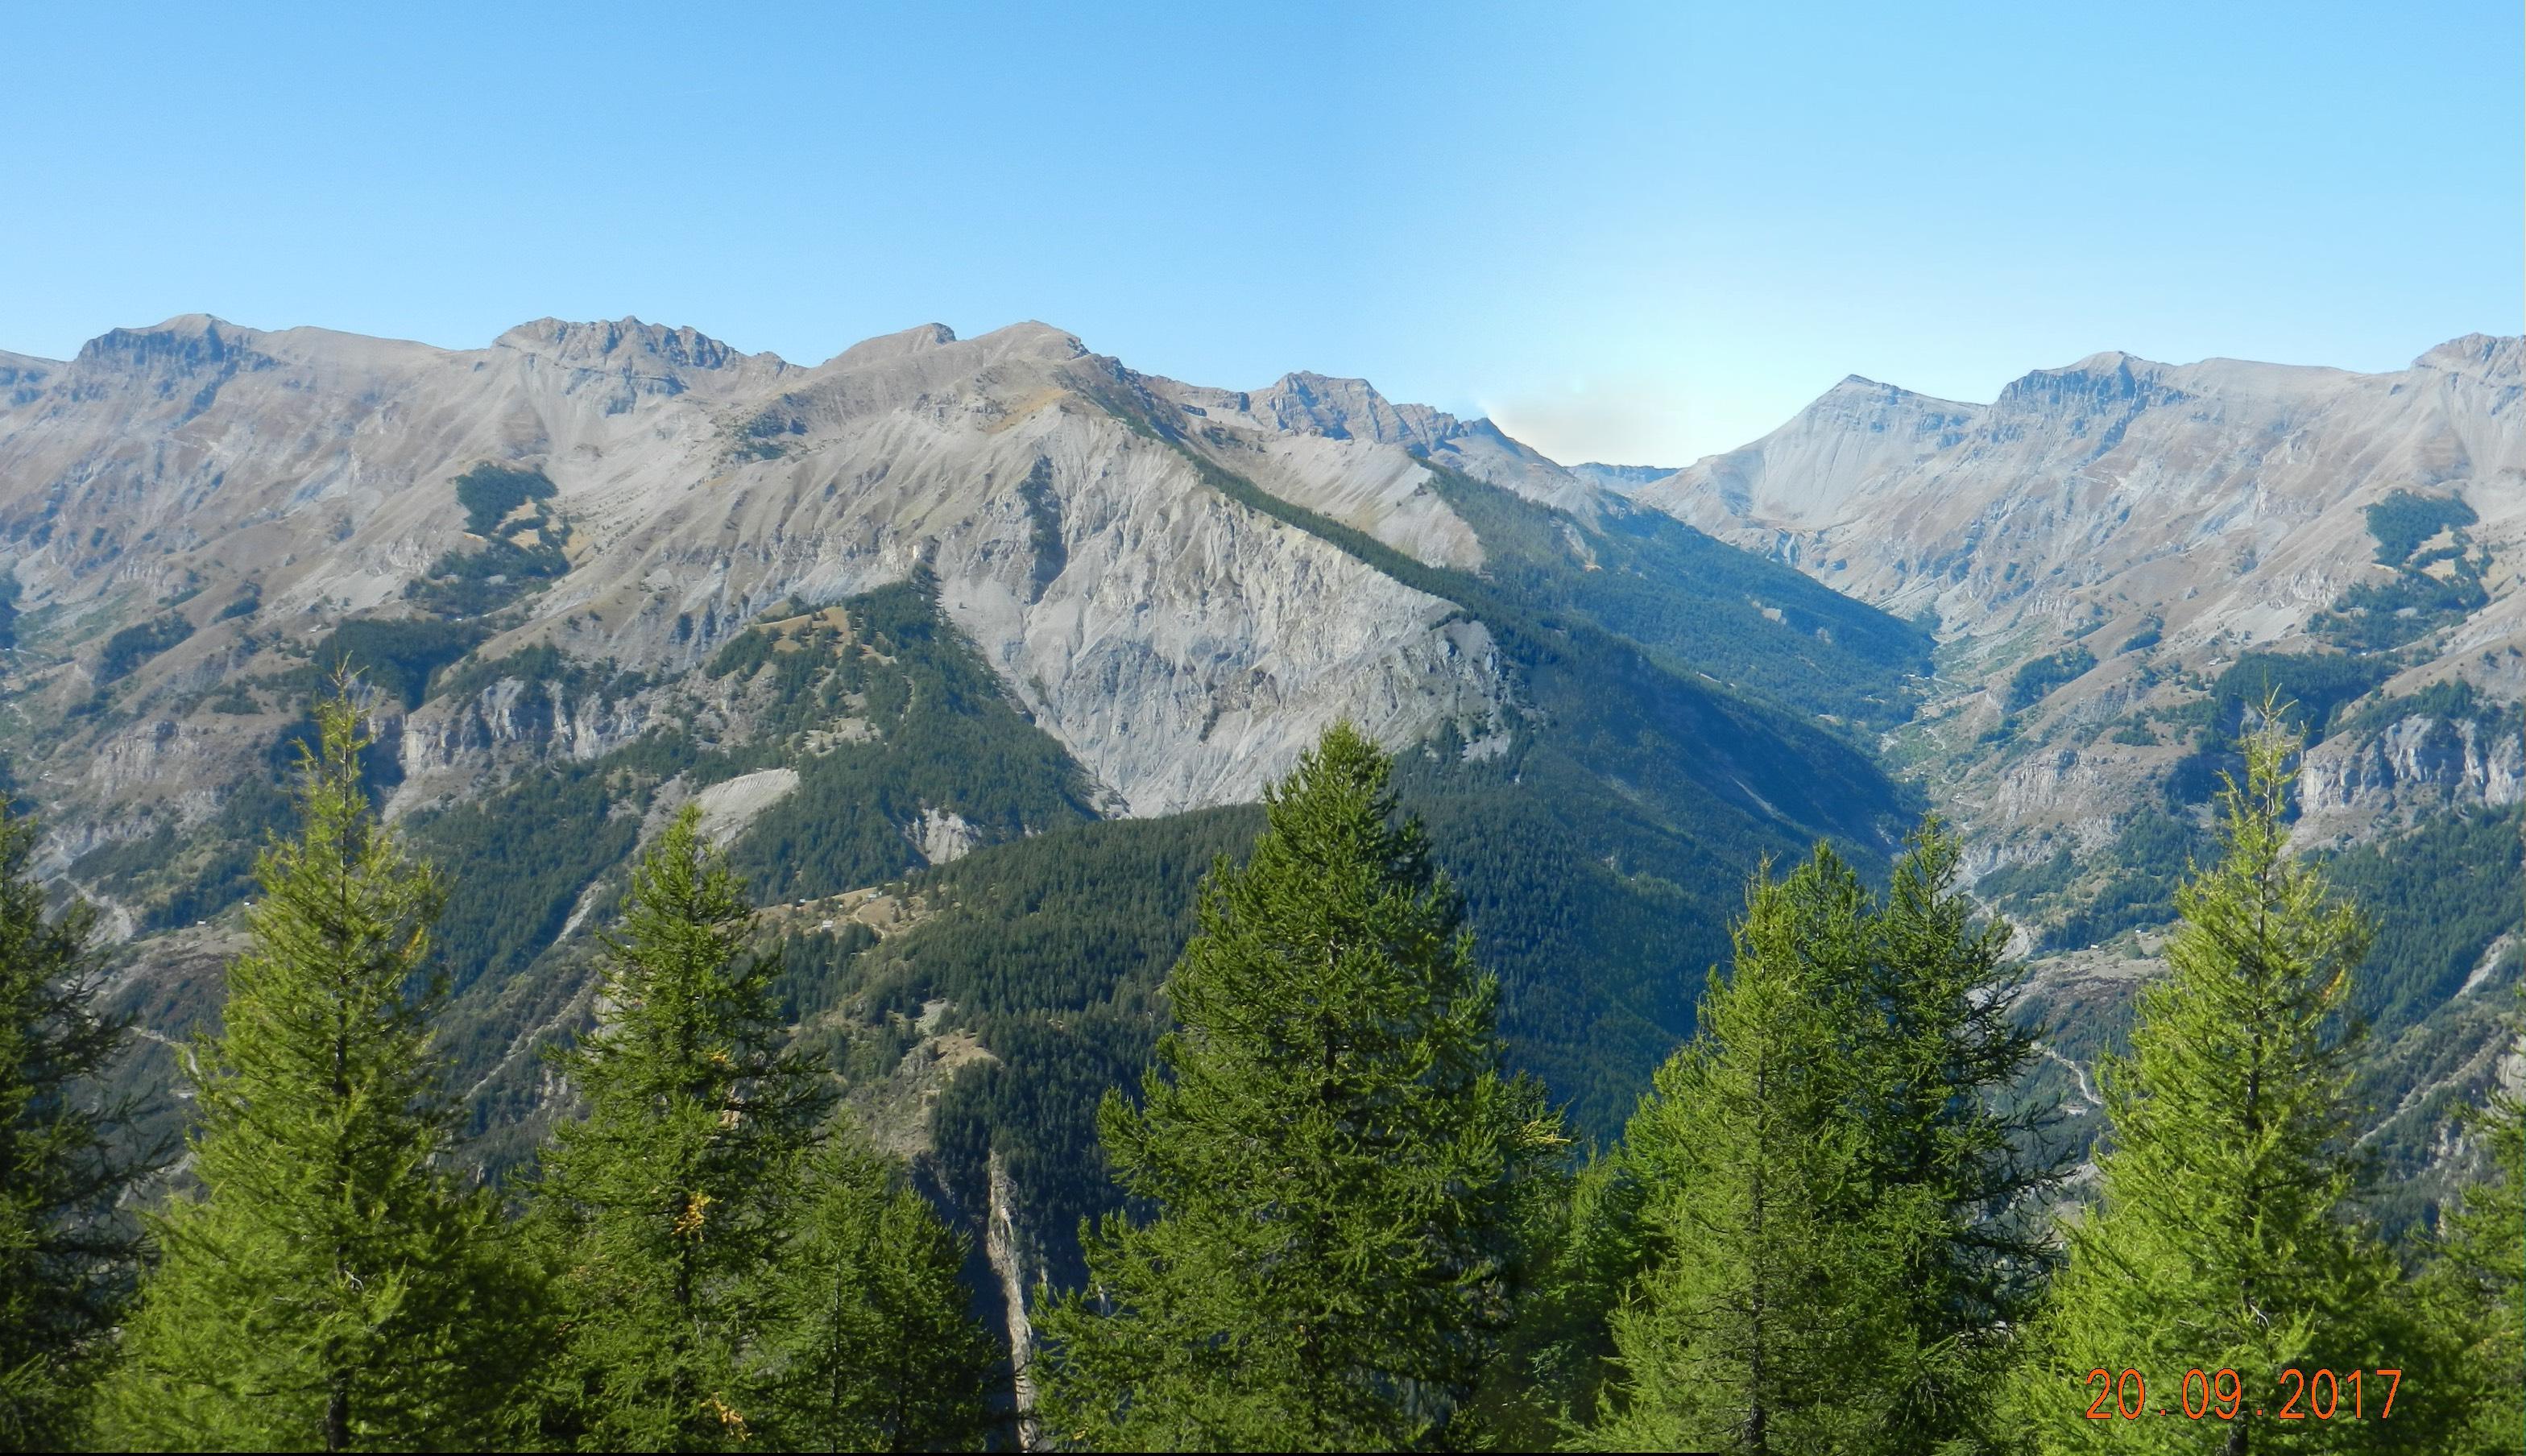 LAST-Panorama